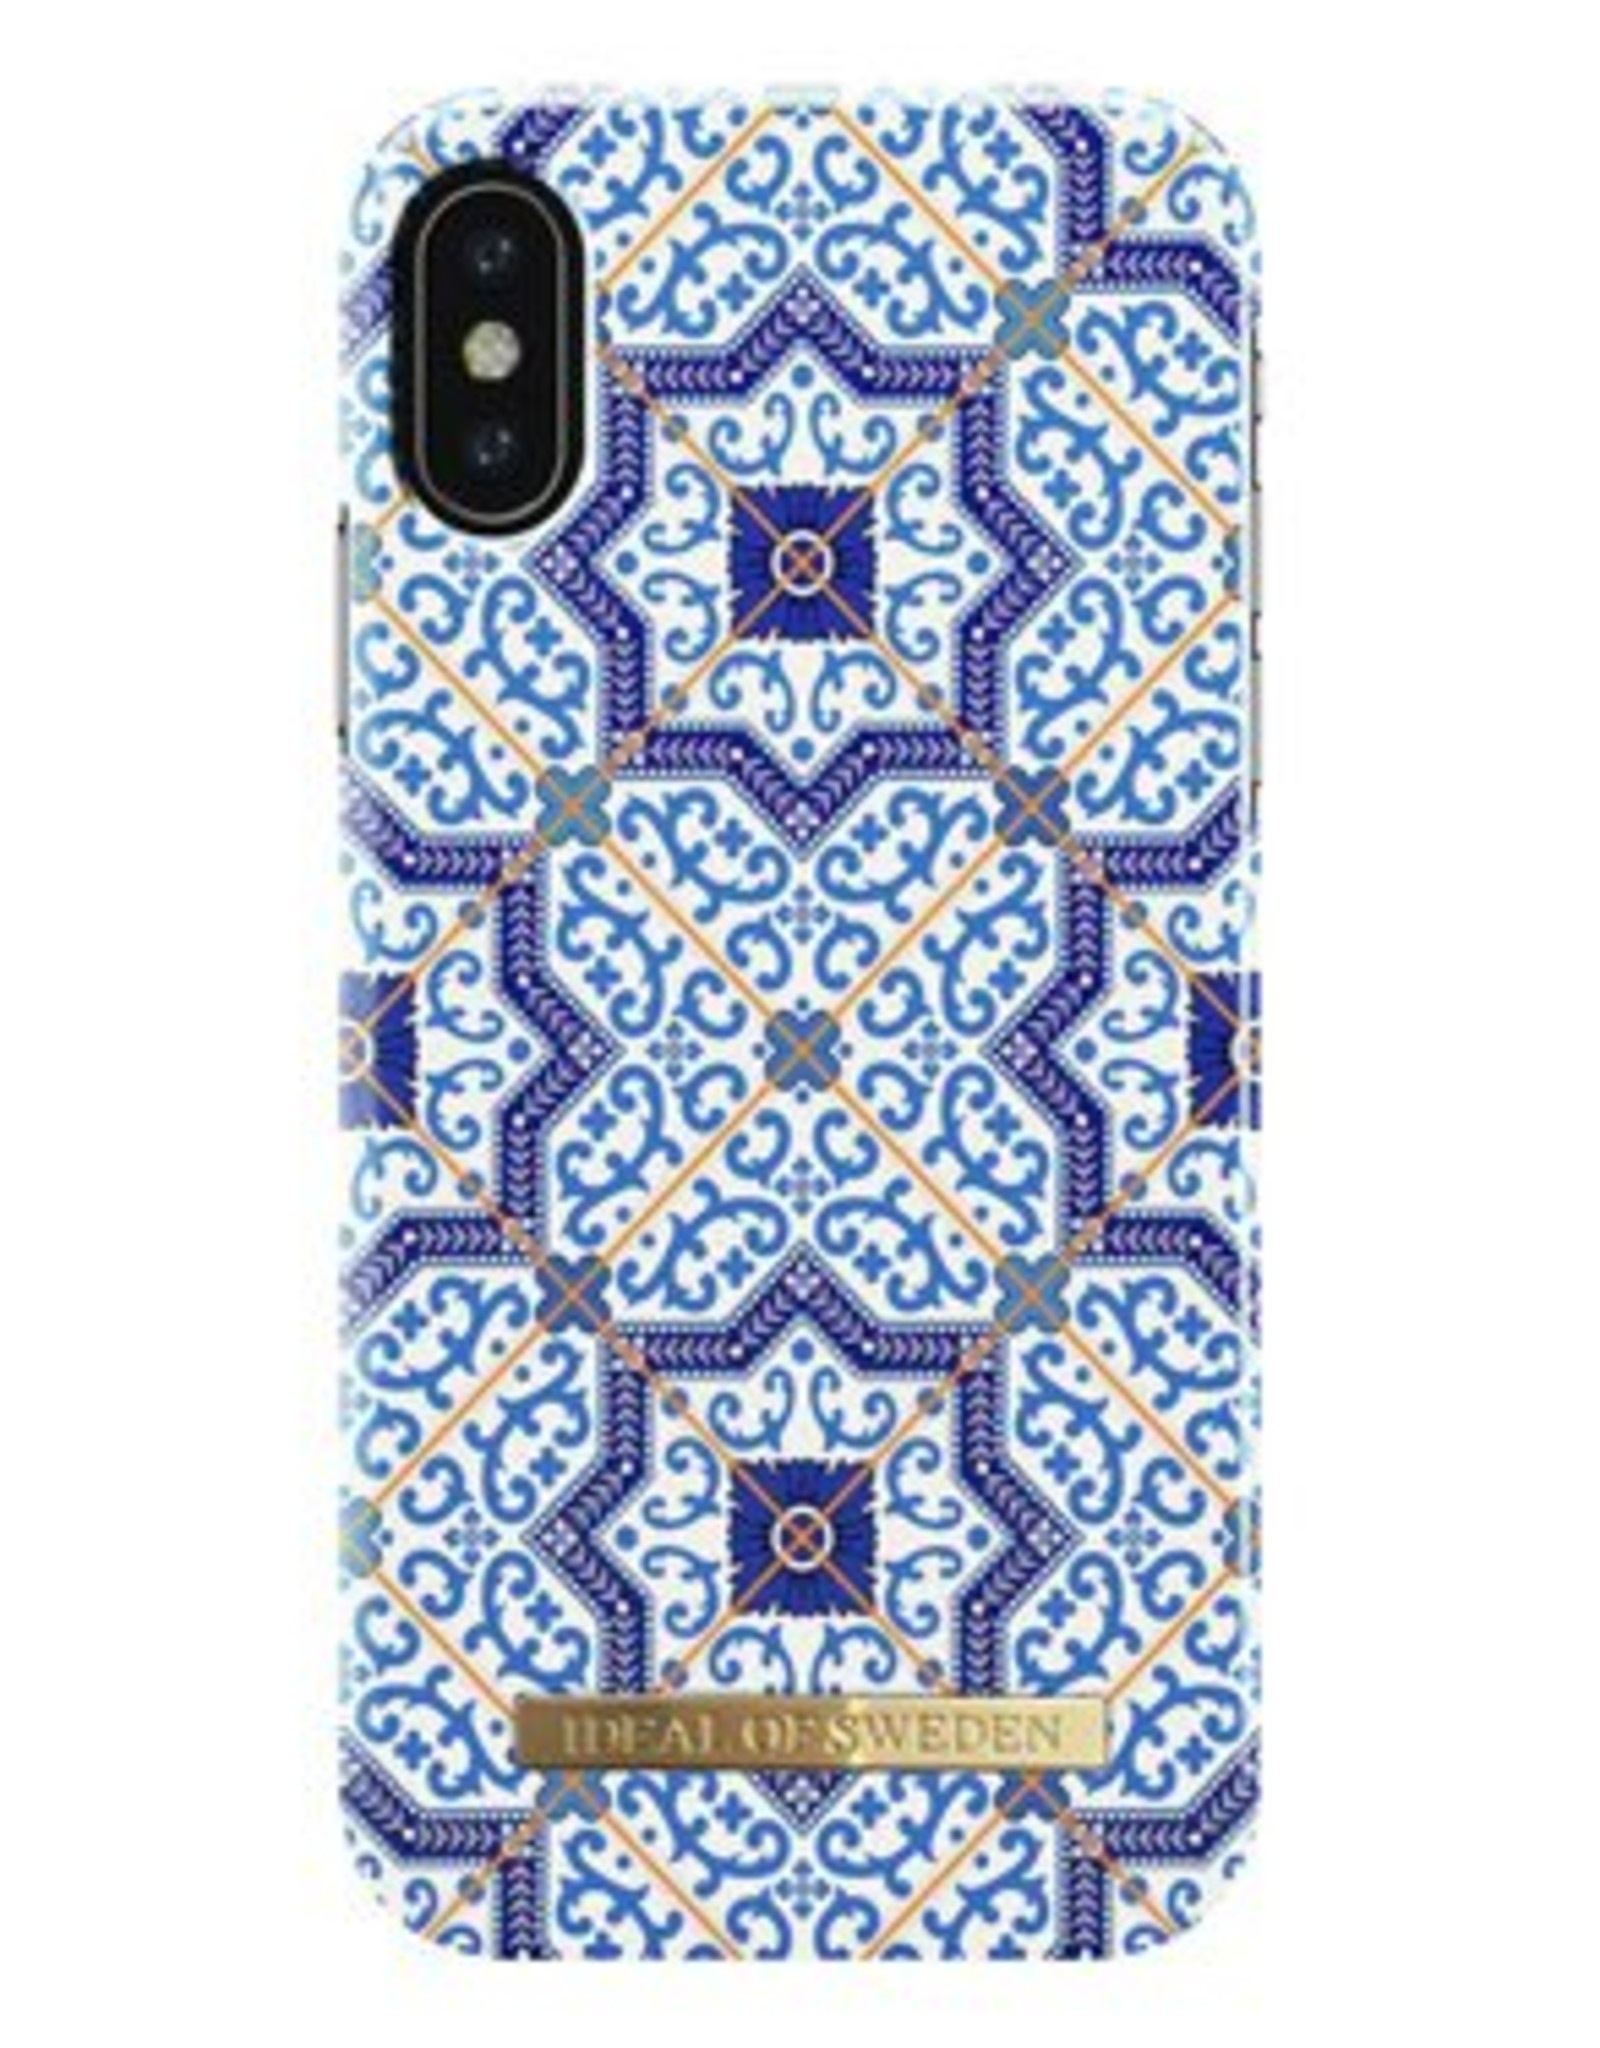 iDeal of Sweden /// Ideal of Sweden | iPhone X/Xs Marrakech Eng | C-IDFCA16-I8-23